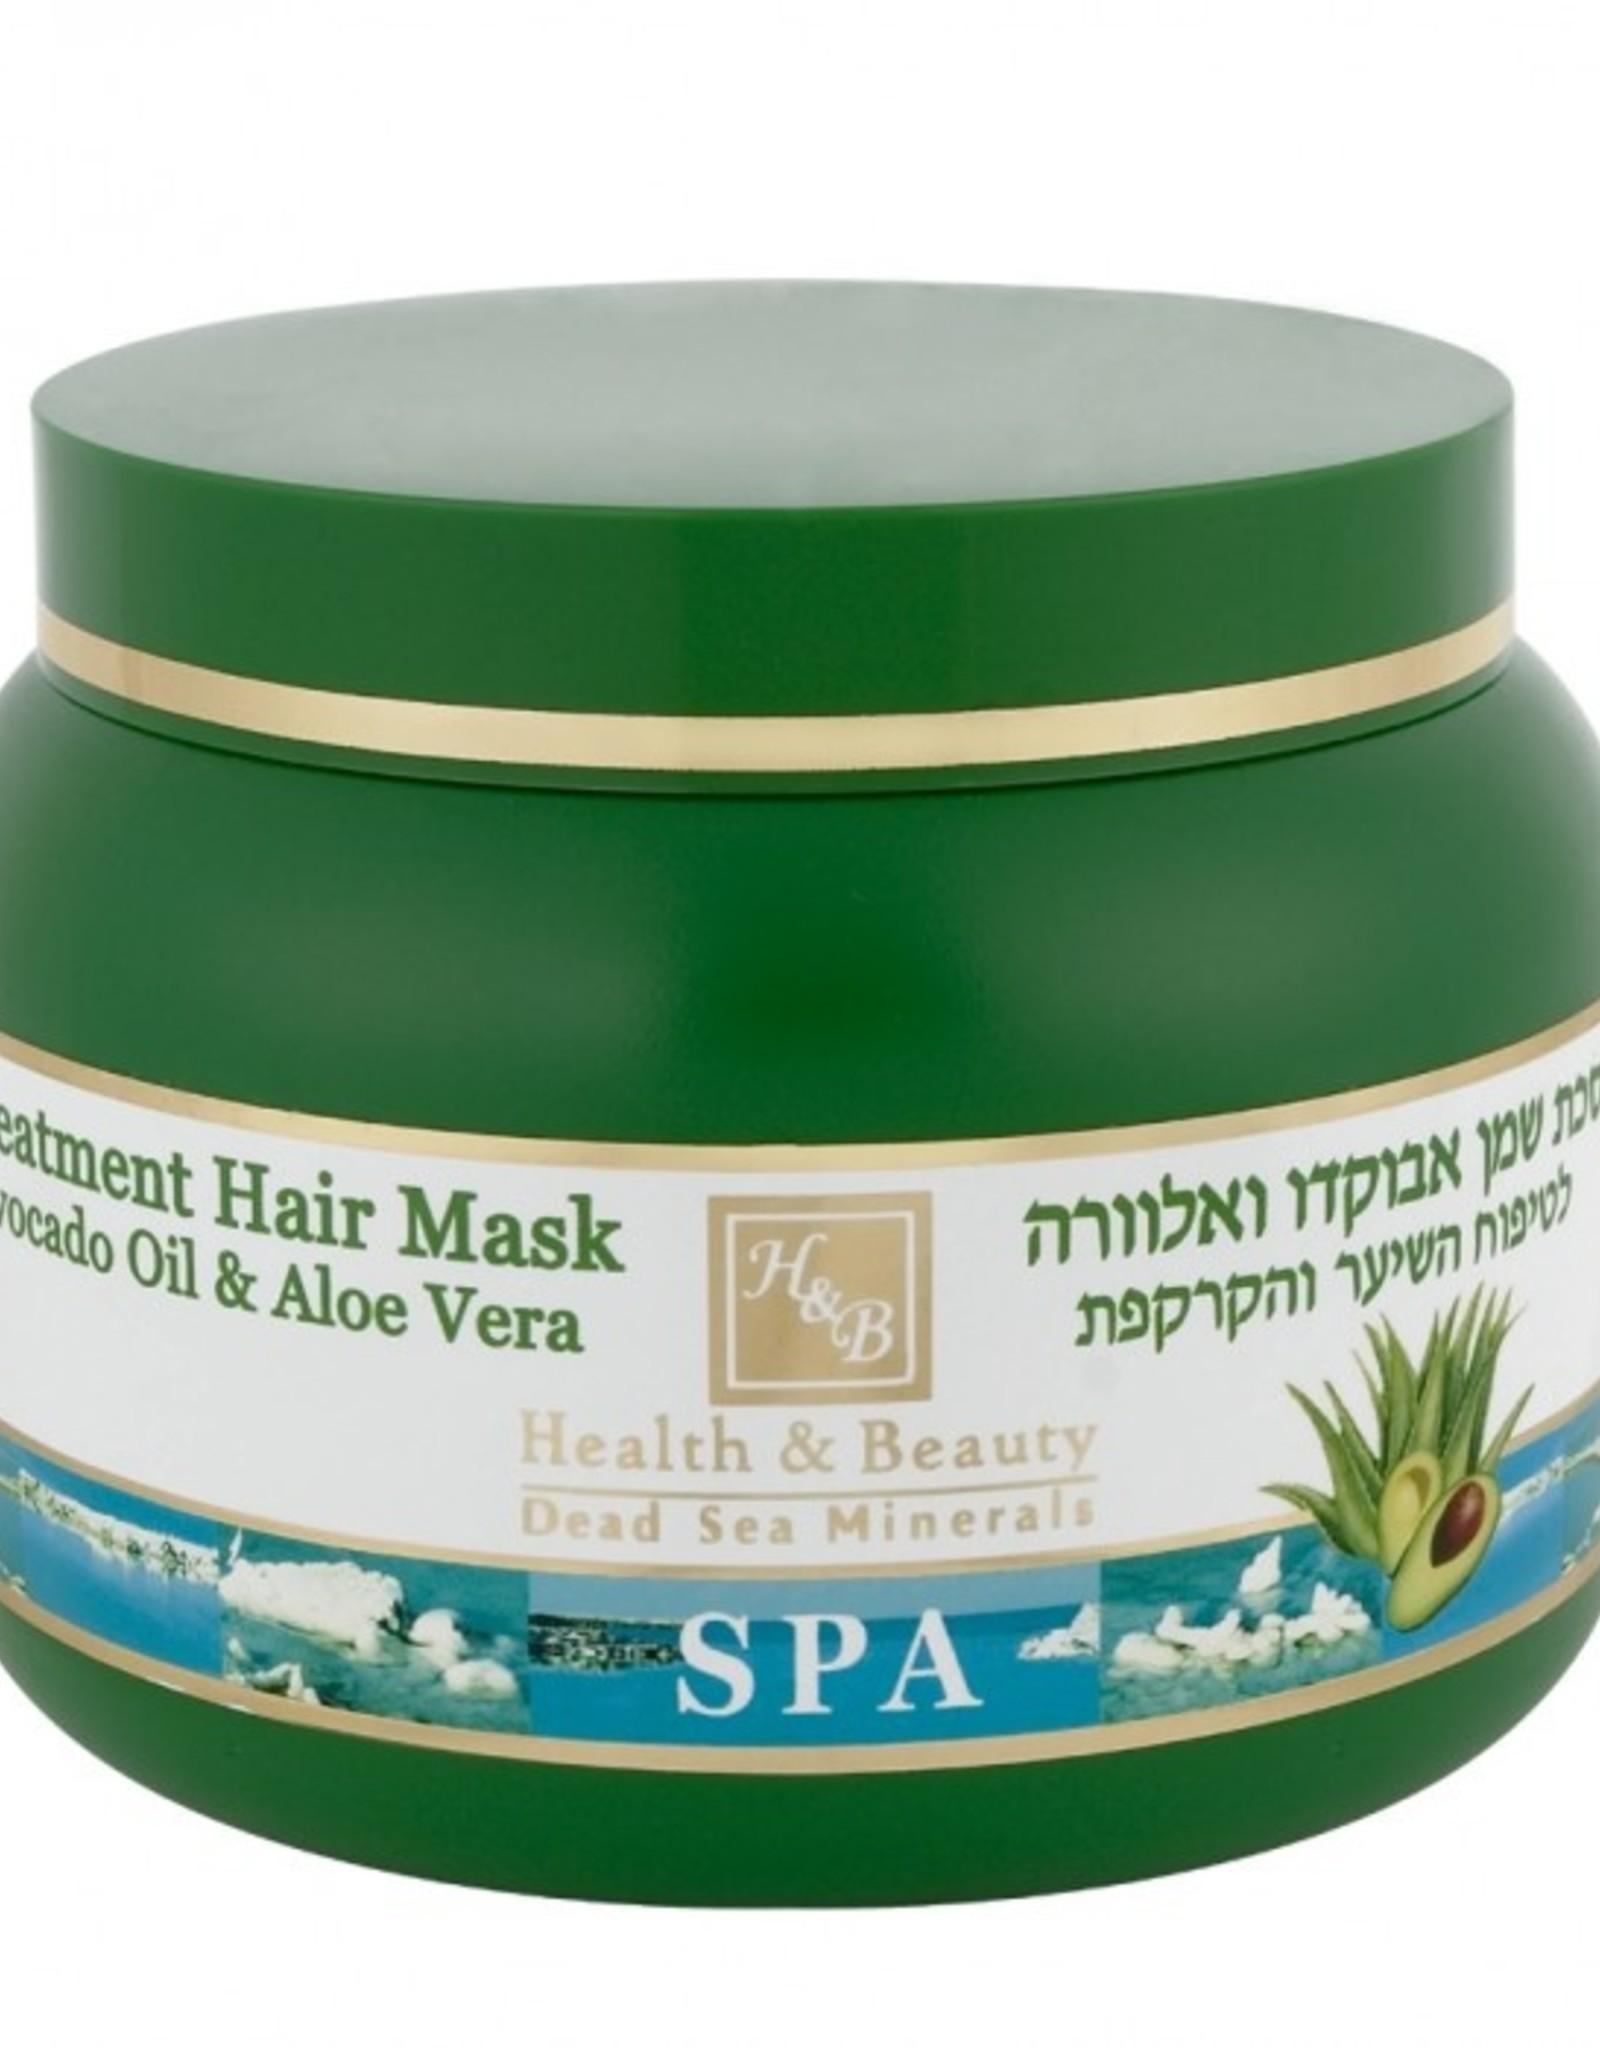 H&B Dead Sea Minerals Avocado/Aloë vera haarmasker; 250 ml.